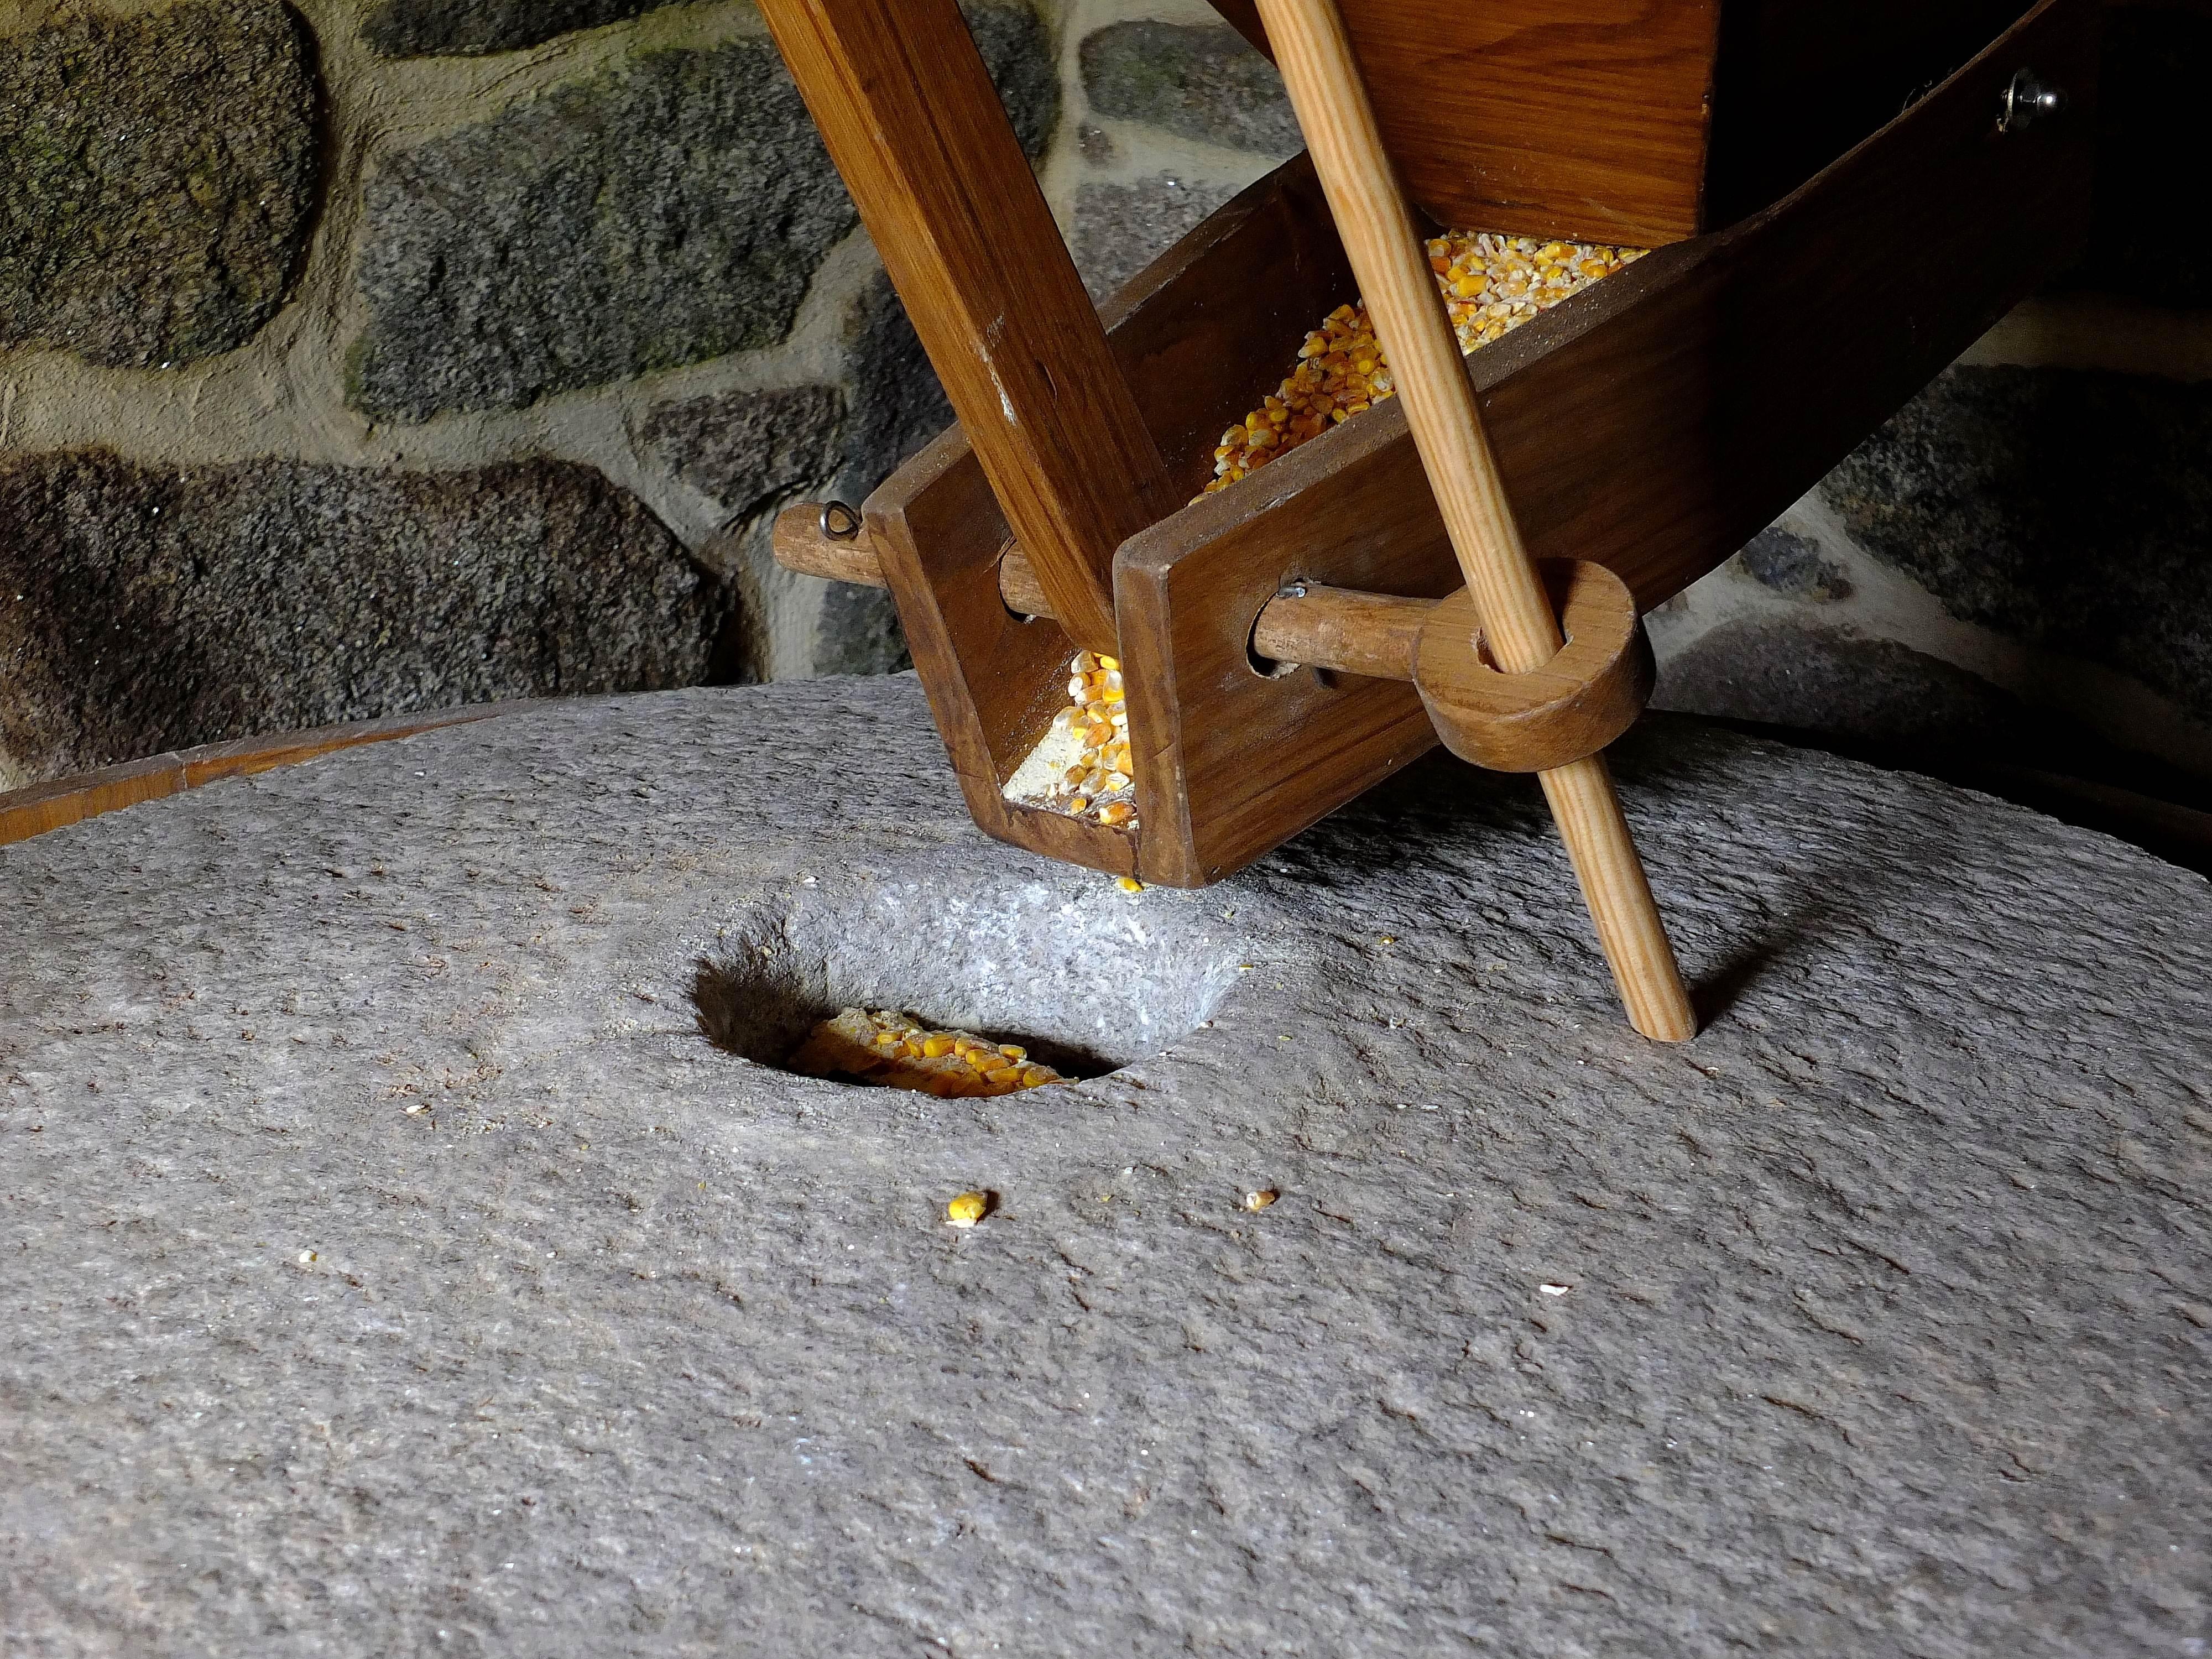 Table Landscape Wood Chair Floor Furniture Spain Galicia Pontevedra  Paisajes Carving Espana Ggl1 Gaby1 Molinosdeagua Alama